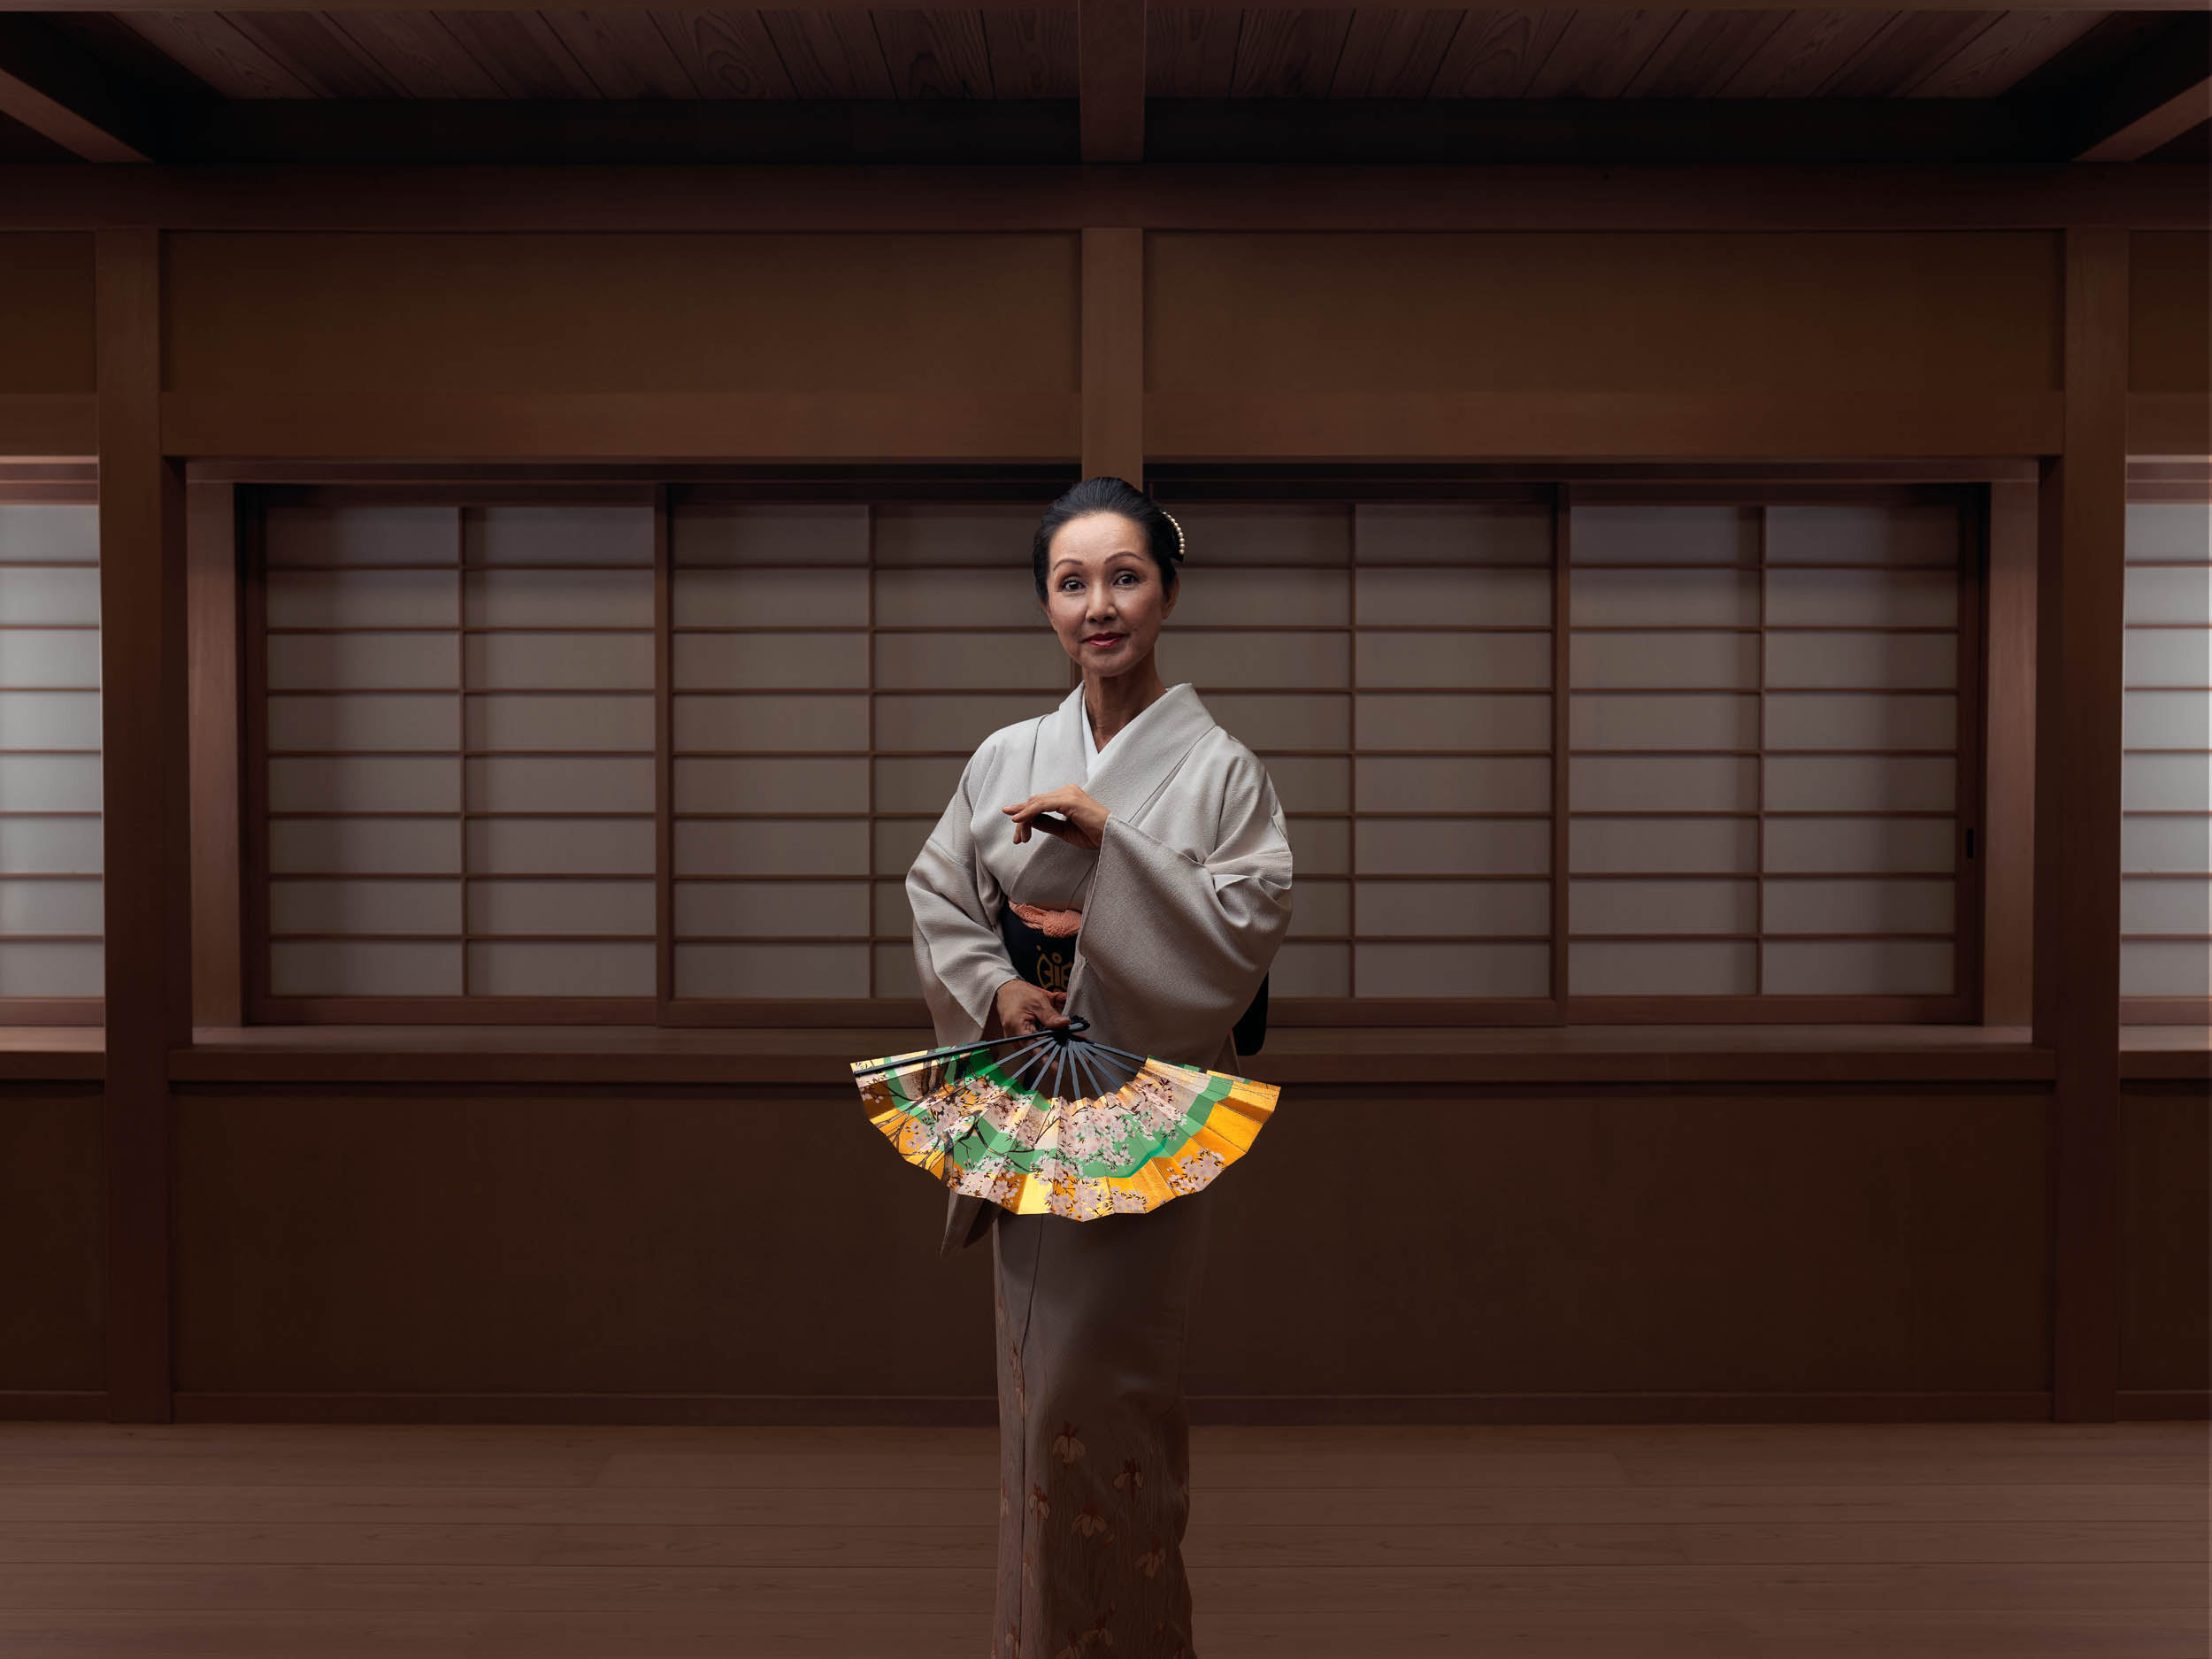 Mako Hattori